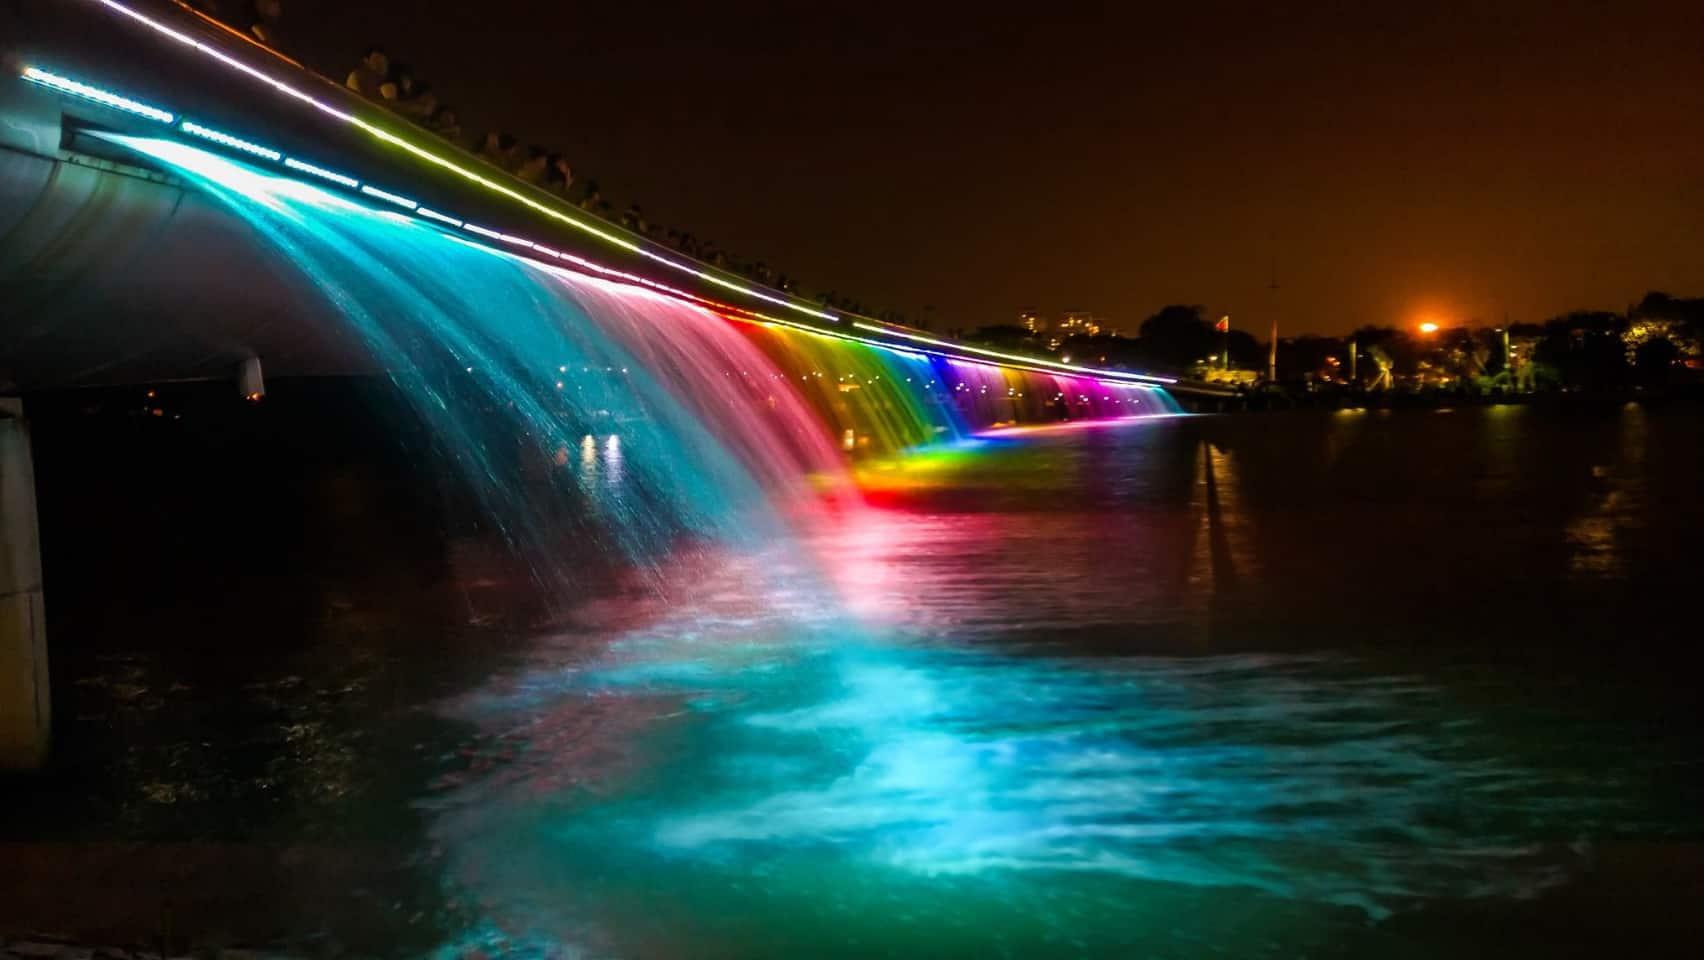 Admire the Saigon Starlight Bridge at night